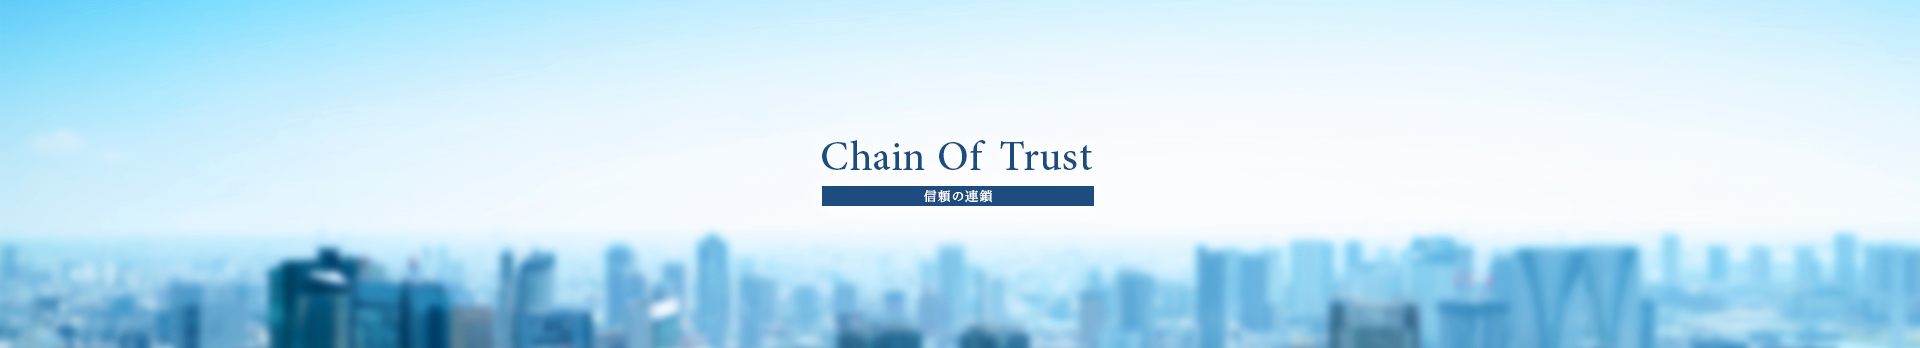 Chain Of Trust 信頼の連鎖